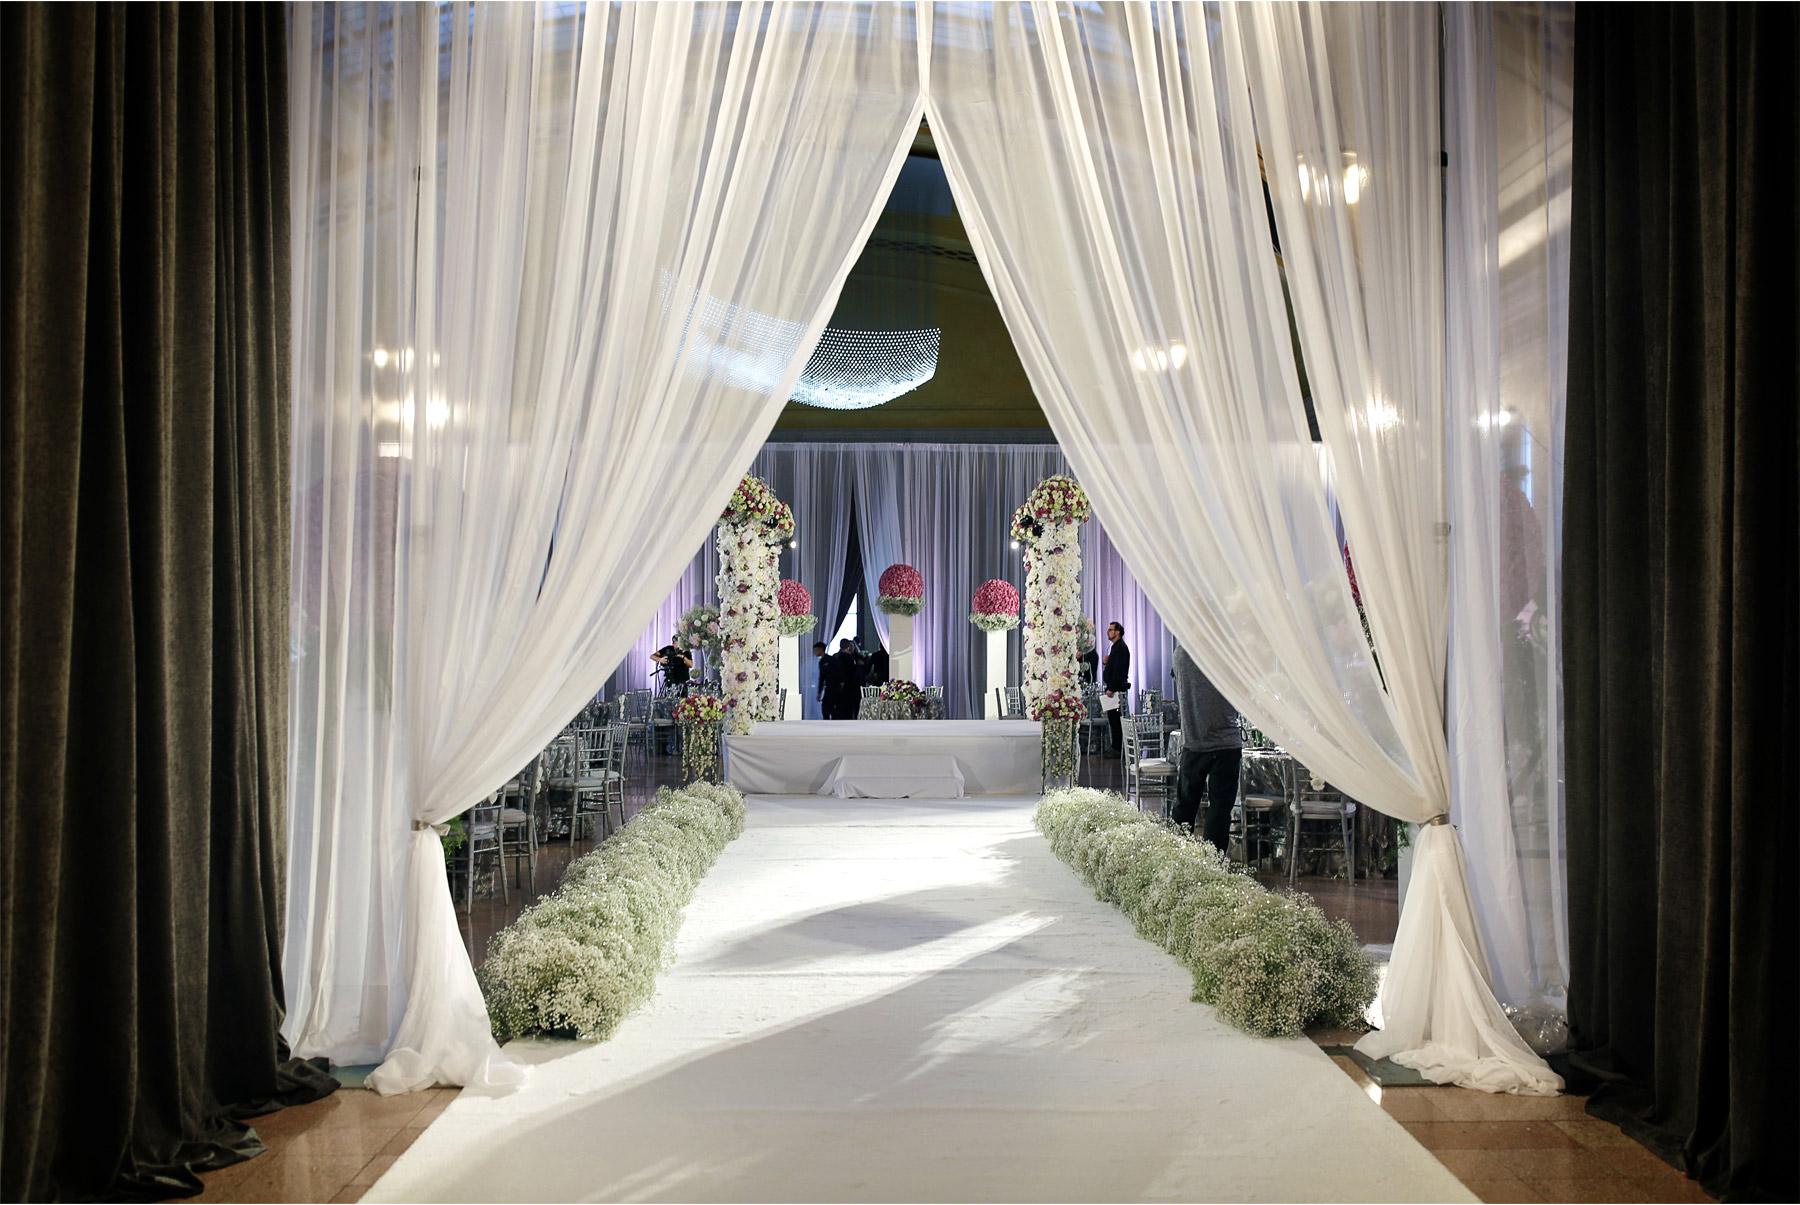 04-Andrew-Vick-Photography-My-Great-Big-Live-Wedding-with-David-Tutera-Behind-the-Scenes-Minnesota-Union-Depot-Saint-Paul-Ceremony.jpg